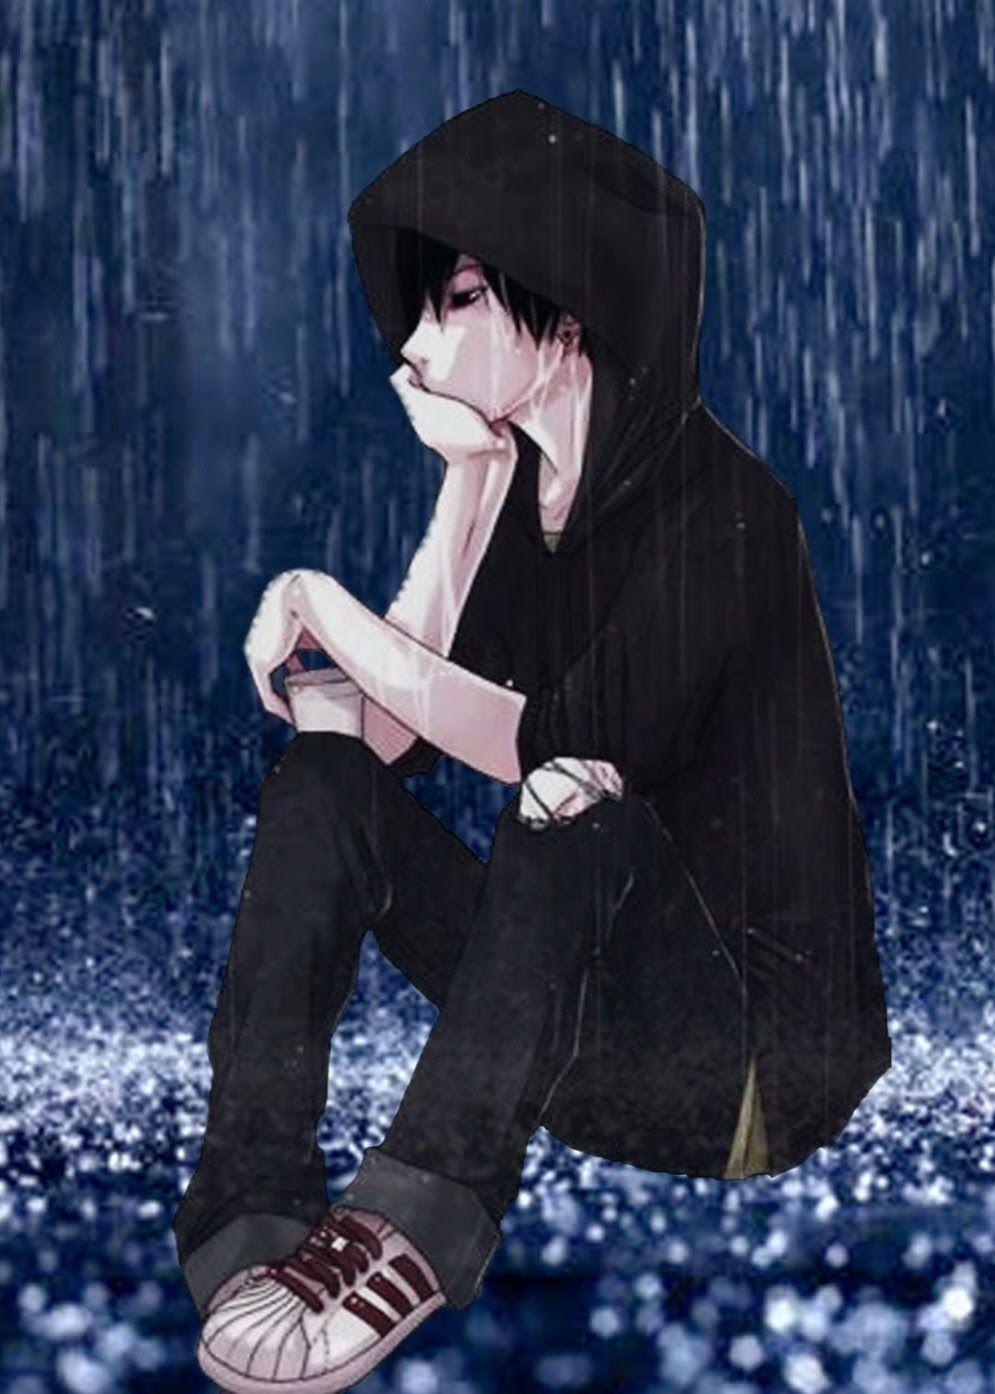 Alone Sad Anime Boys Wallpapers Top Free Alone Sad Anime Boys Backgrounds Wallpaperaccess